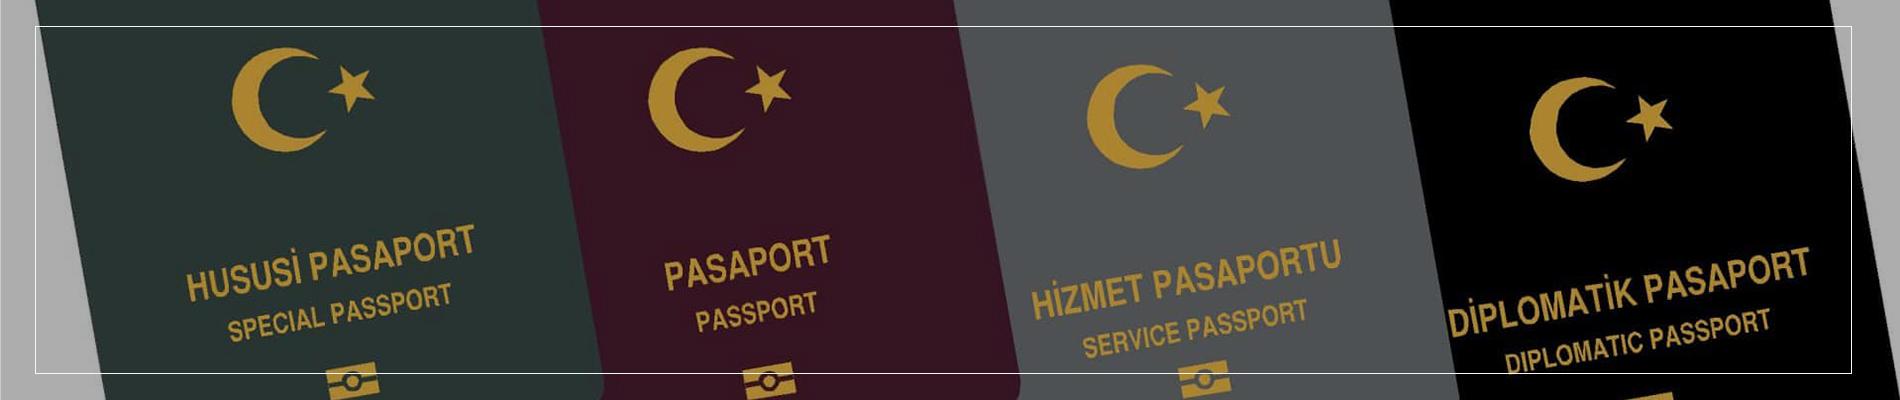 Turkish Passport Types